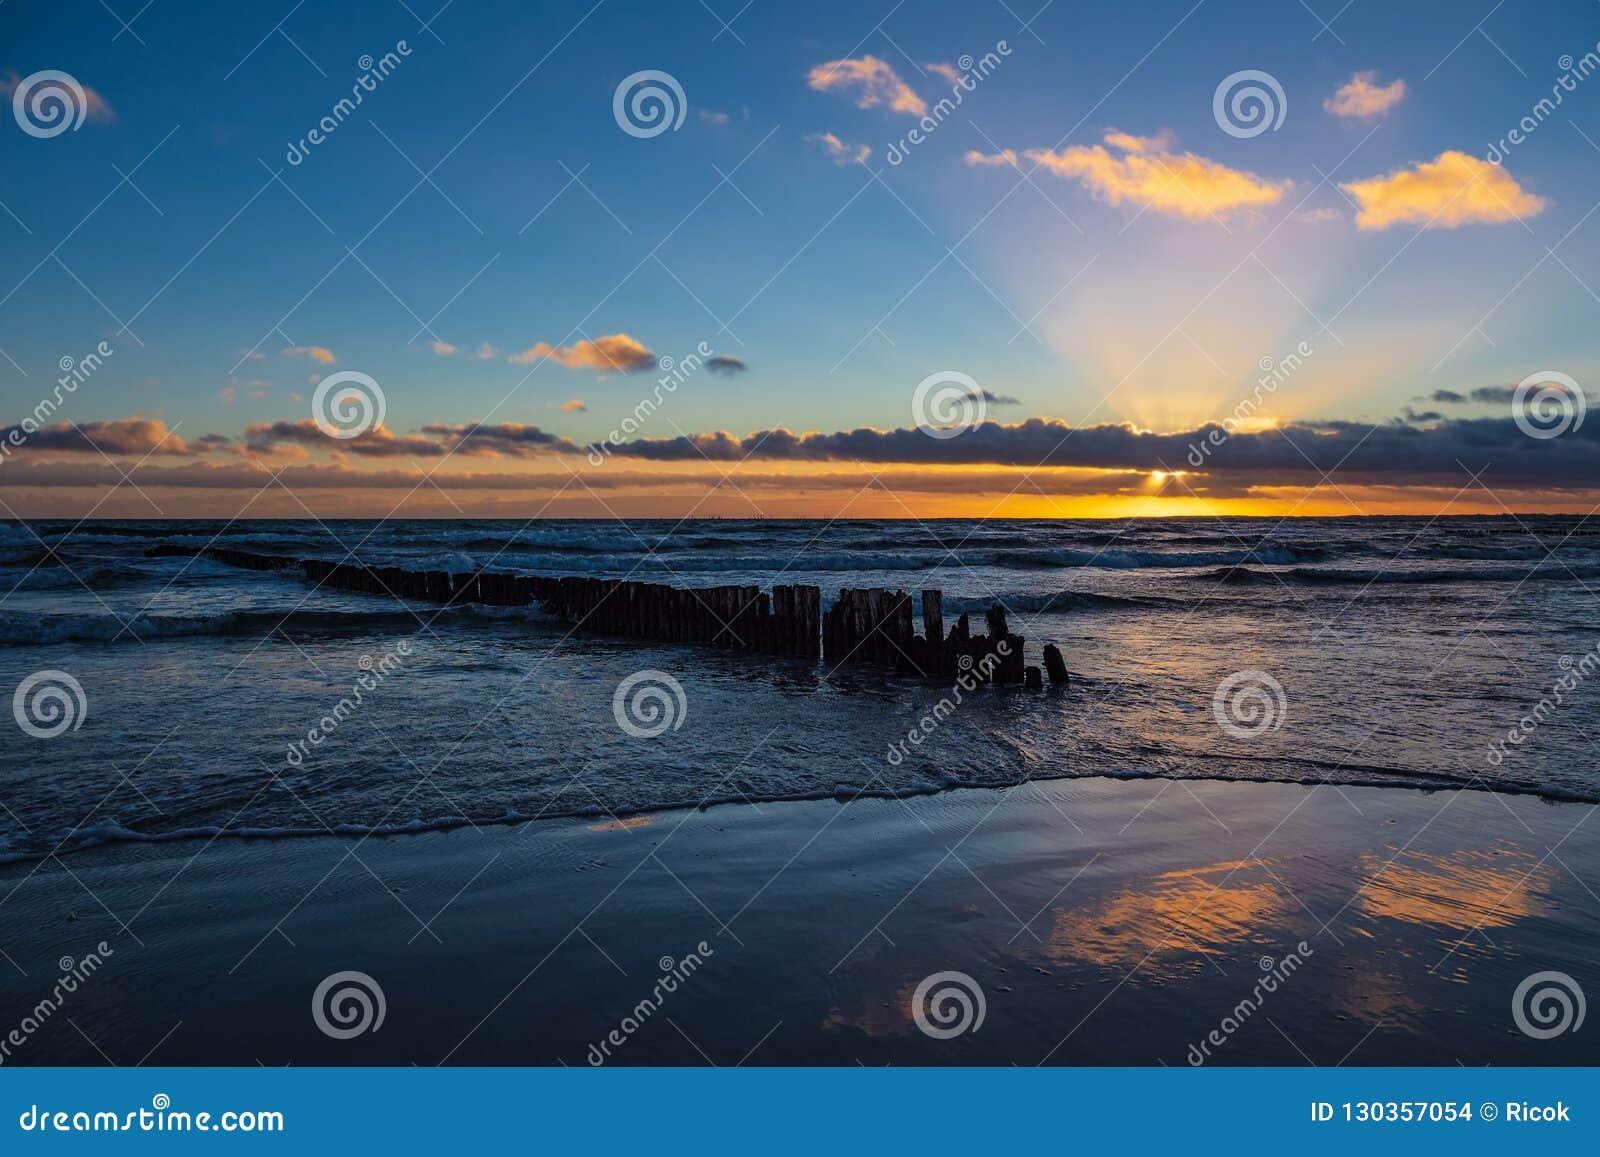 Baltic Sea coast on the island Moen in Denmark